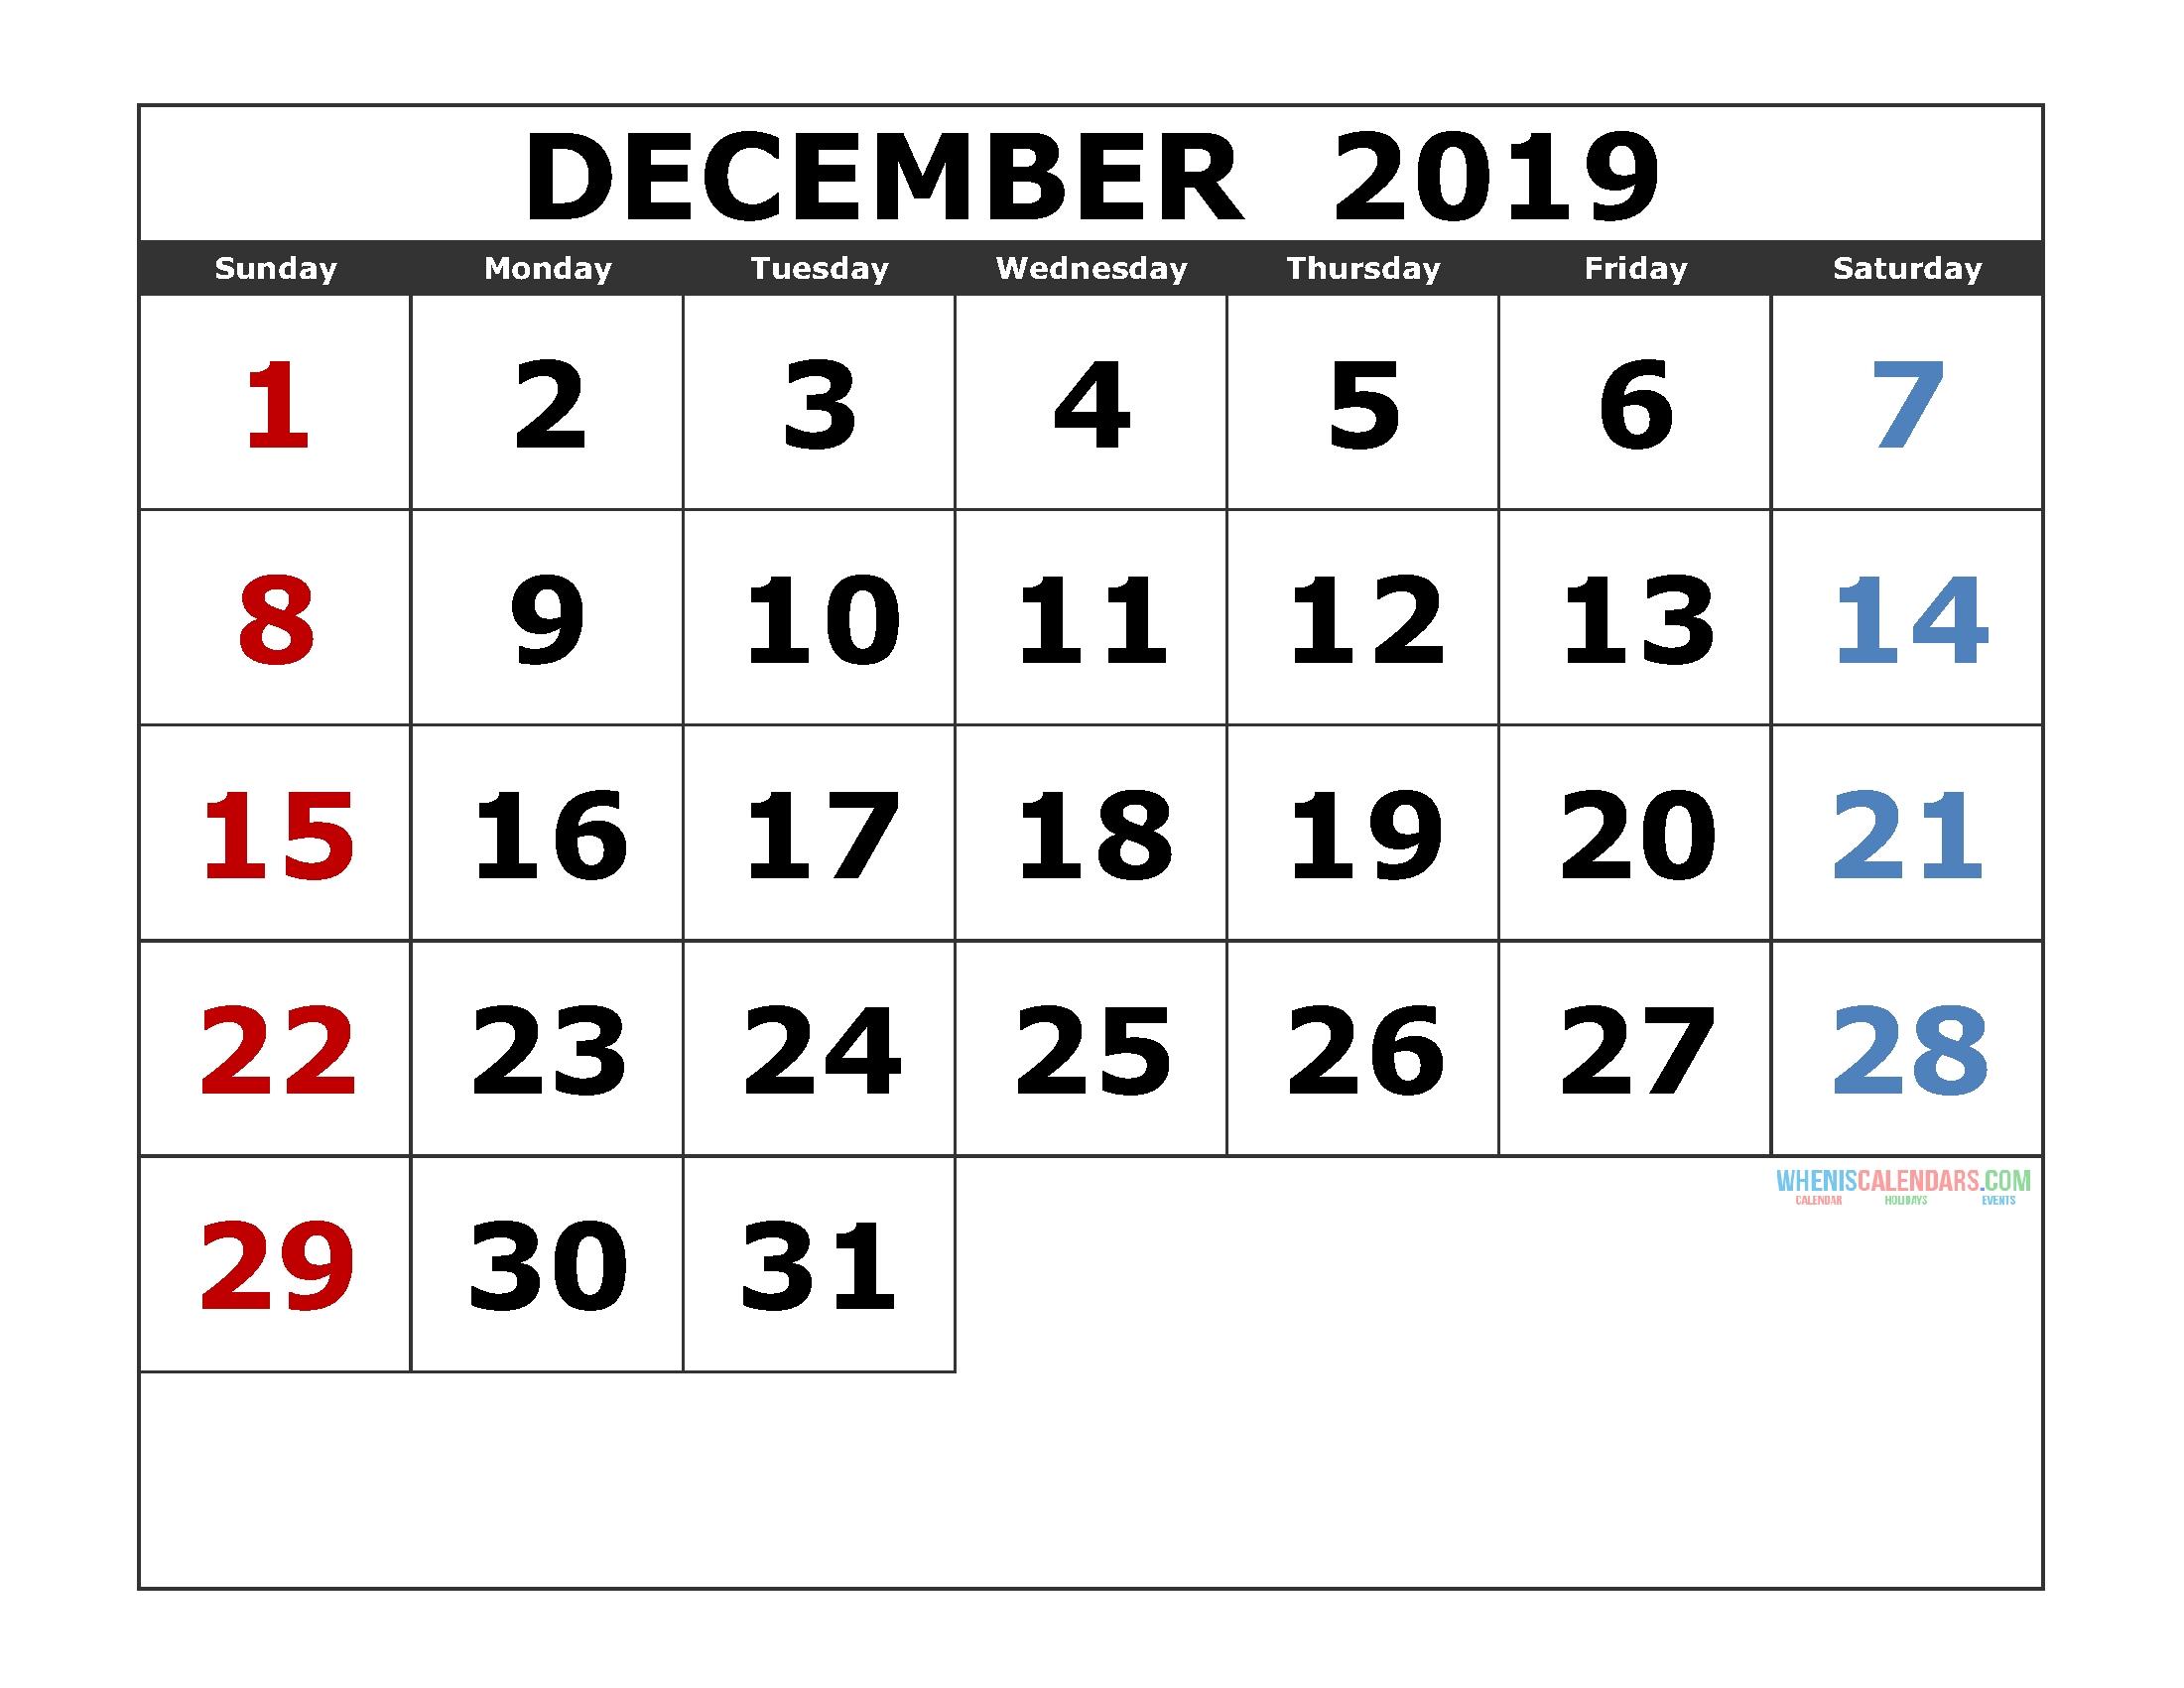 December 2019 Printable Calendar Templates [ 2019 Monthly